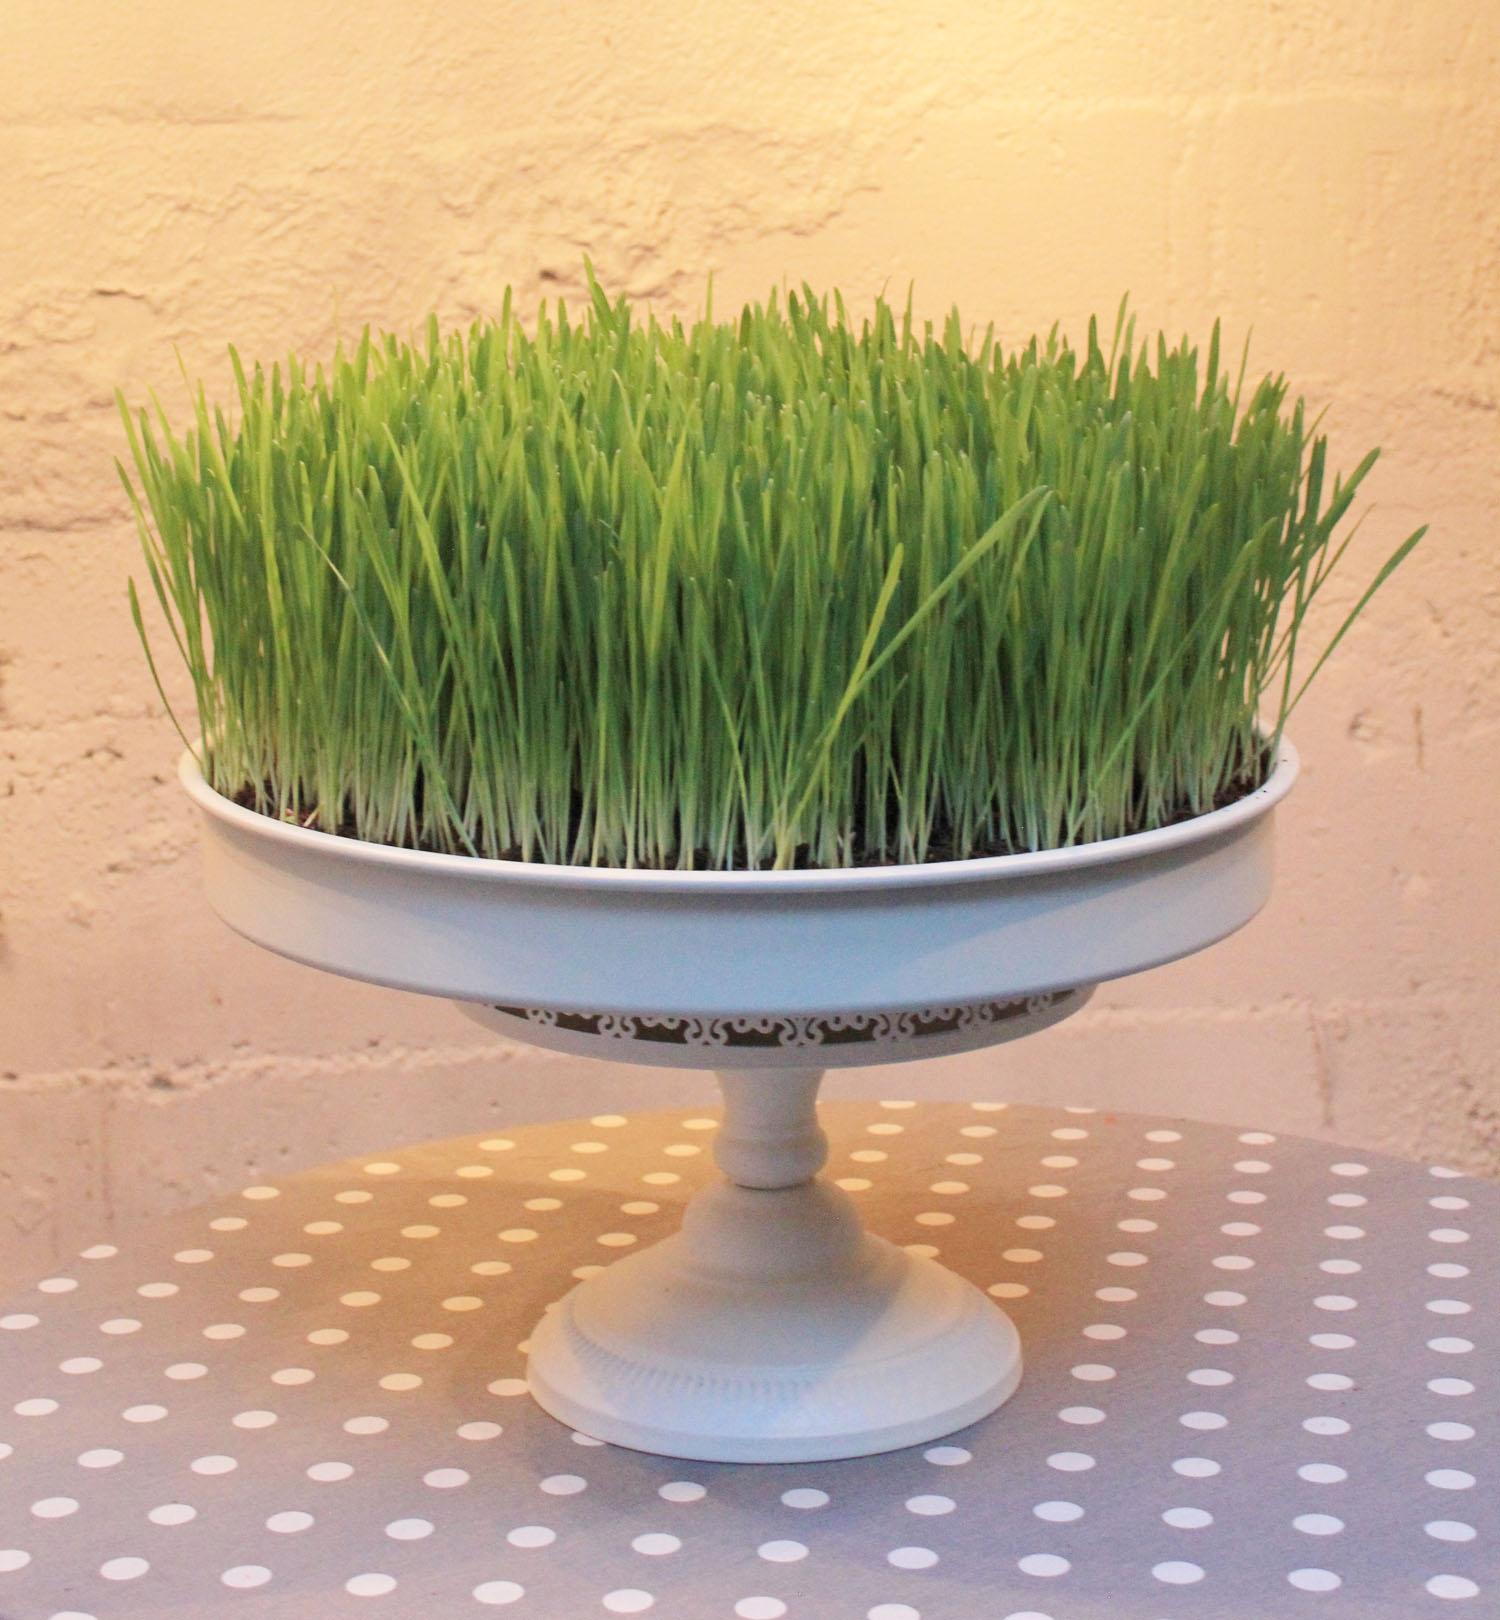 Custom Grass Cake by Laura Phelps Rogers 3240design llc.jpg